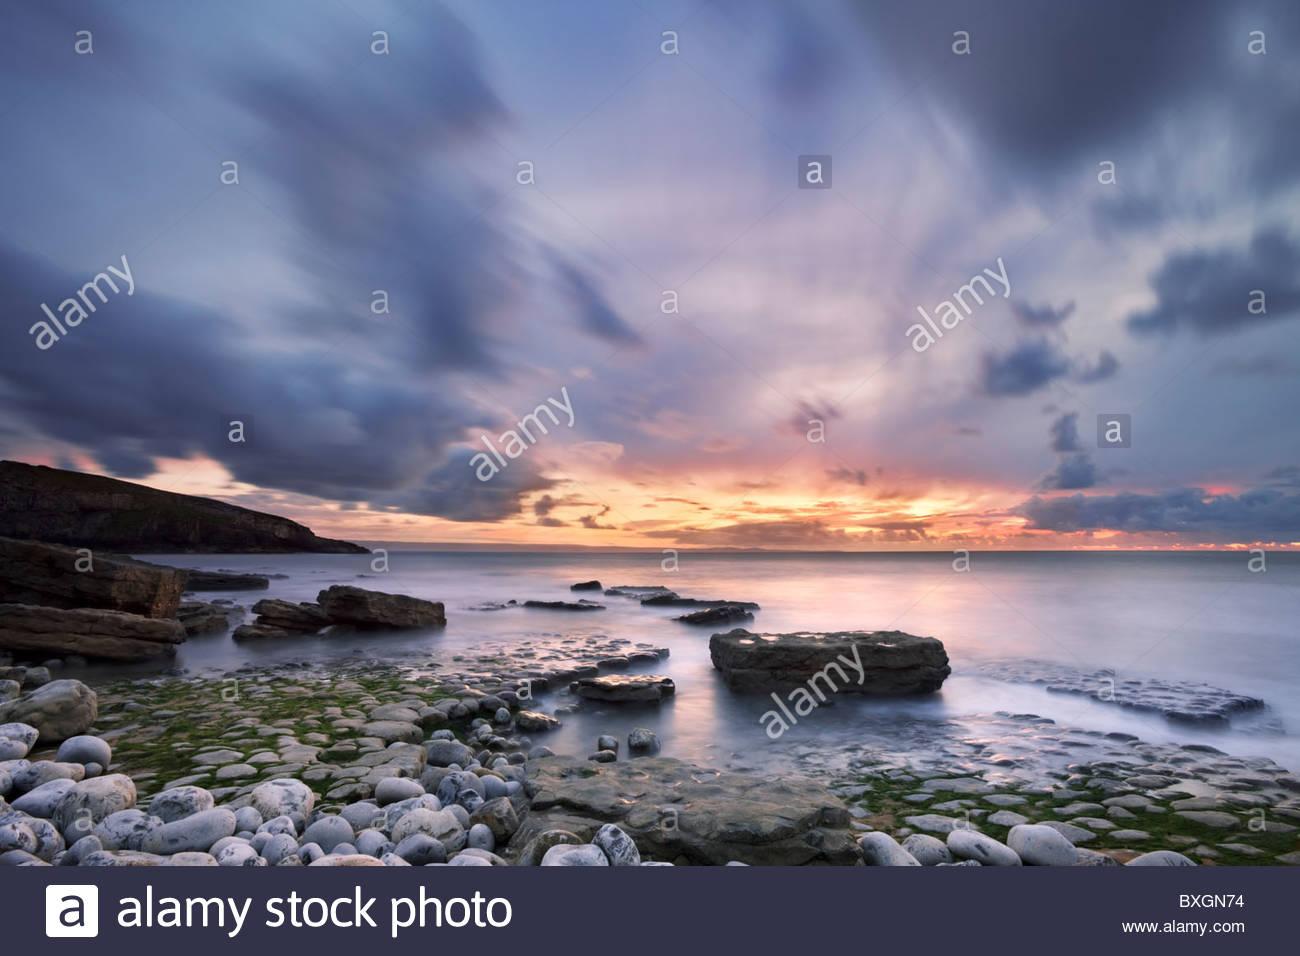 Dunraven Bay, South Glamorgan, Wales, UK Stockbild